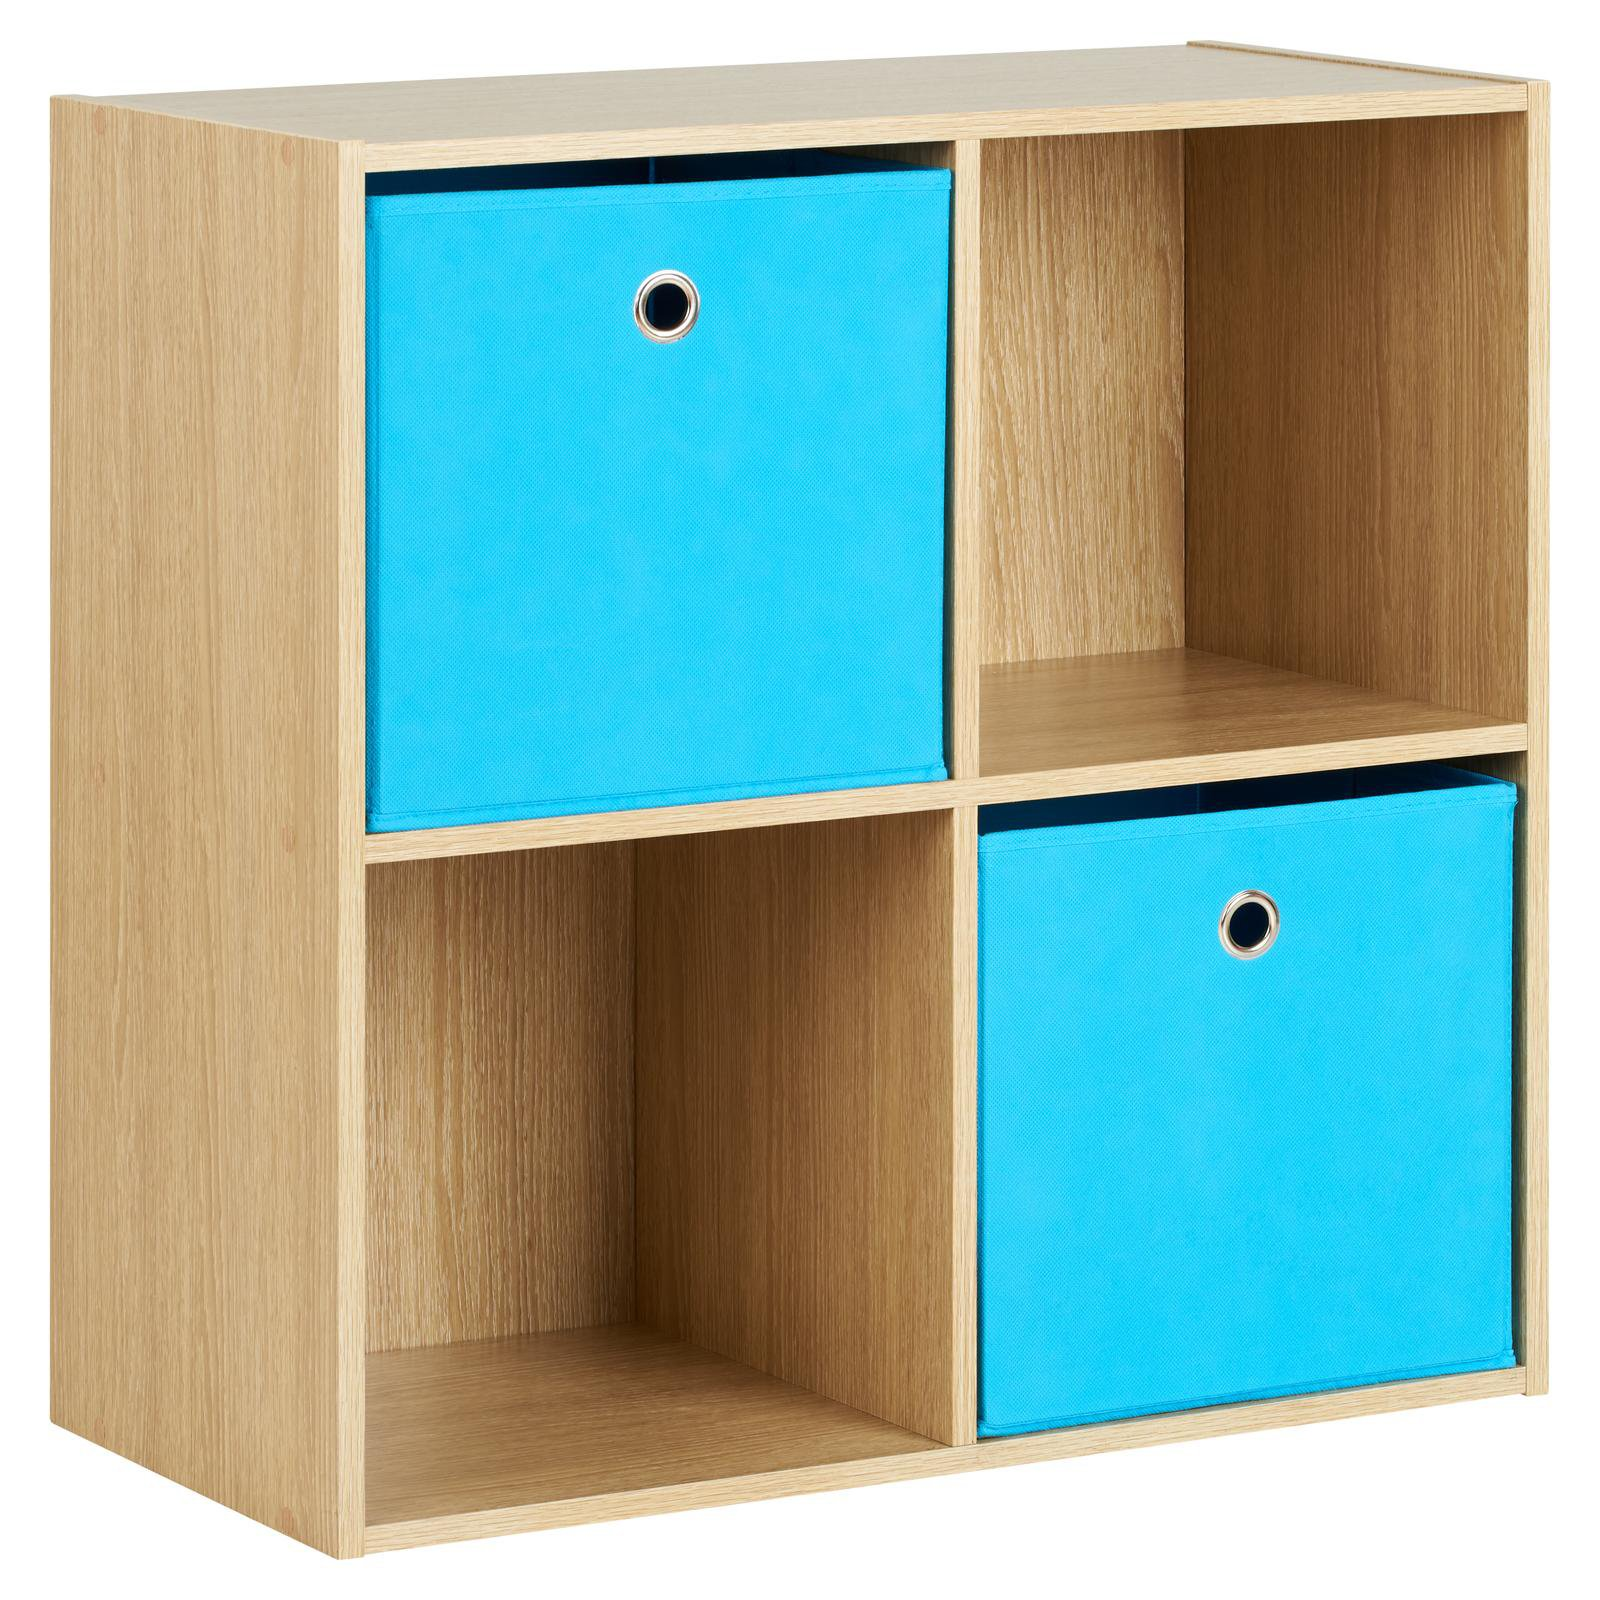 image-Hartleys Oak 4 Cube Storage Unit & 2 Easy Grasp Box Drawers - Blue